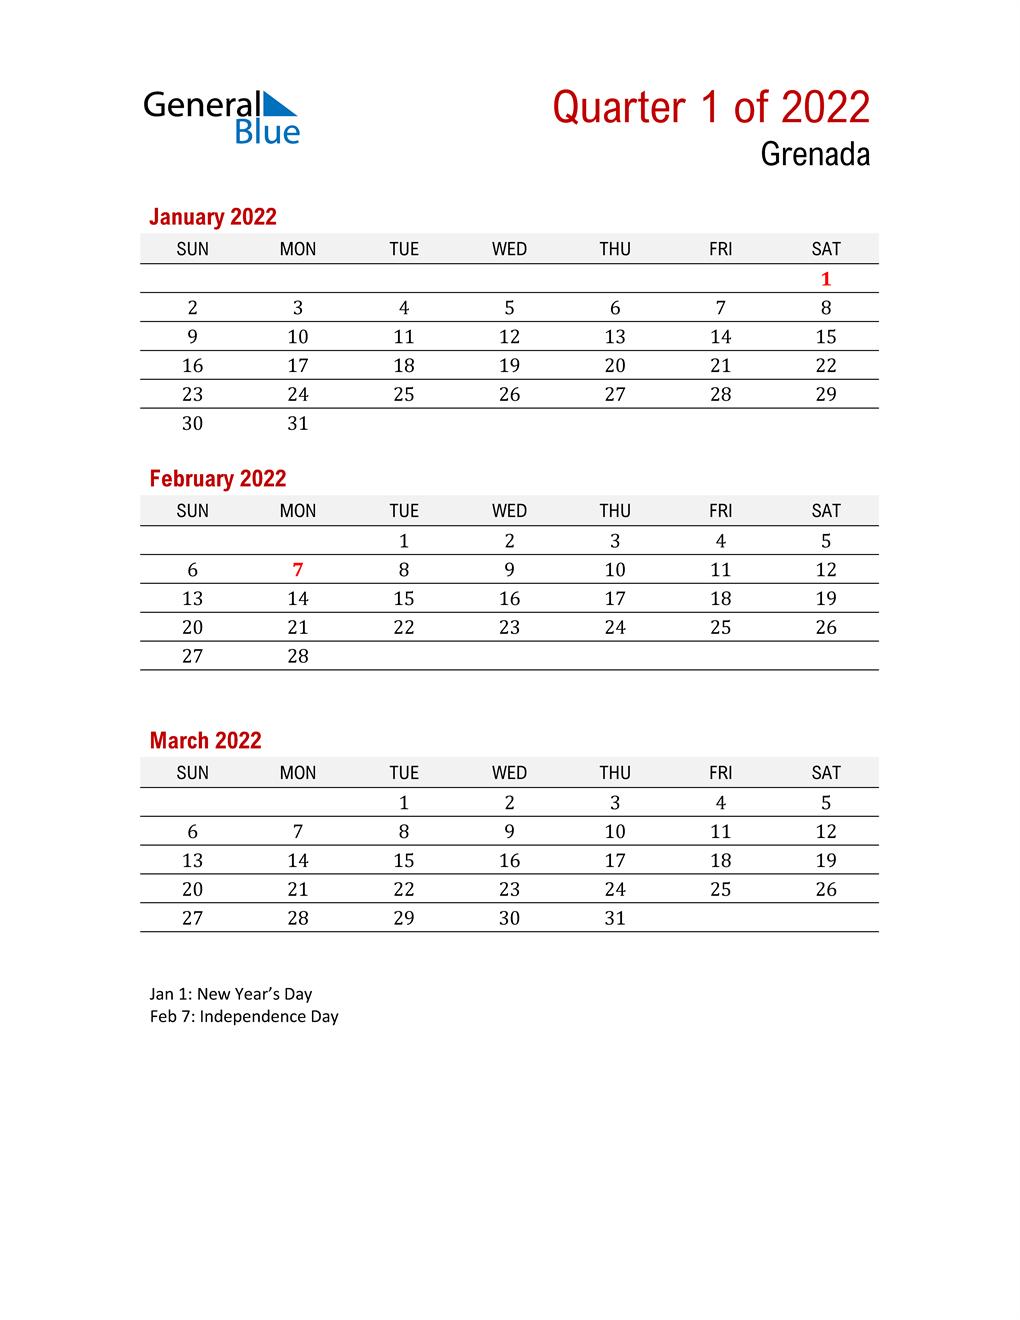 Printable Three Month Calendar for Grenada